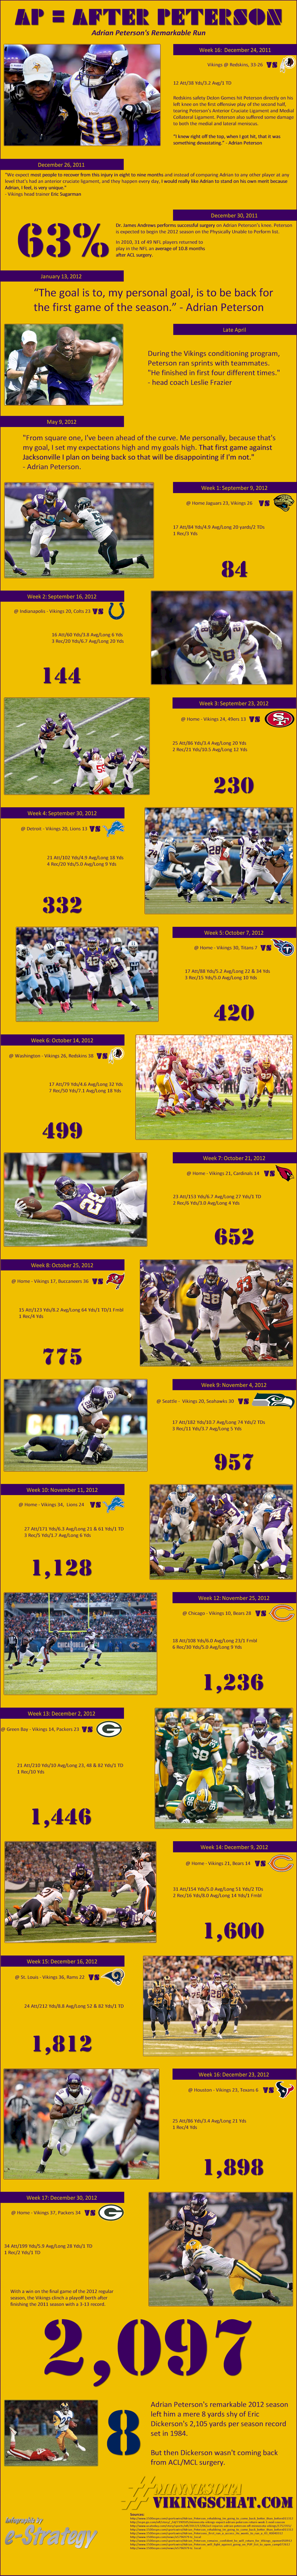 Infographic - Adrian Peterson's 2012 Season